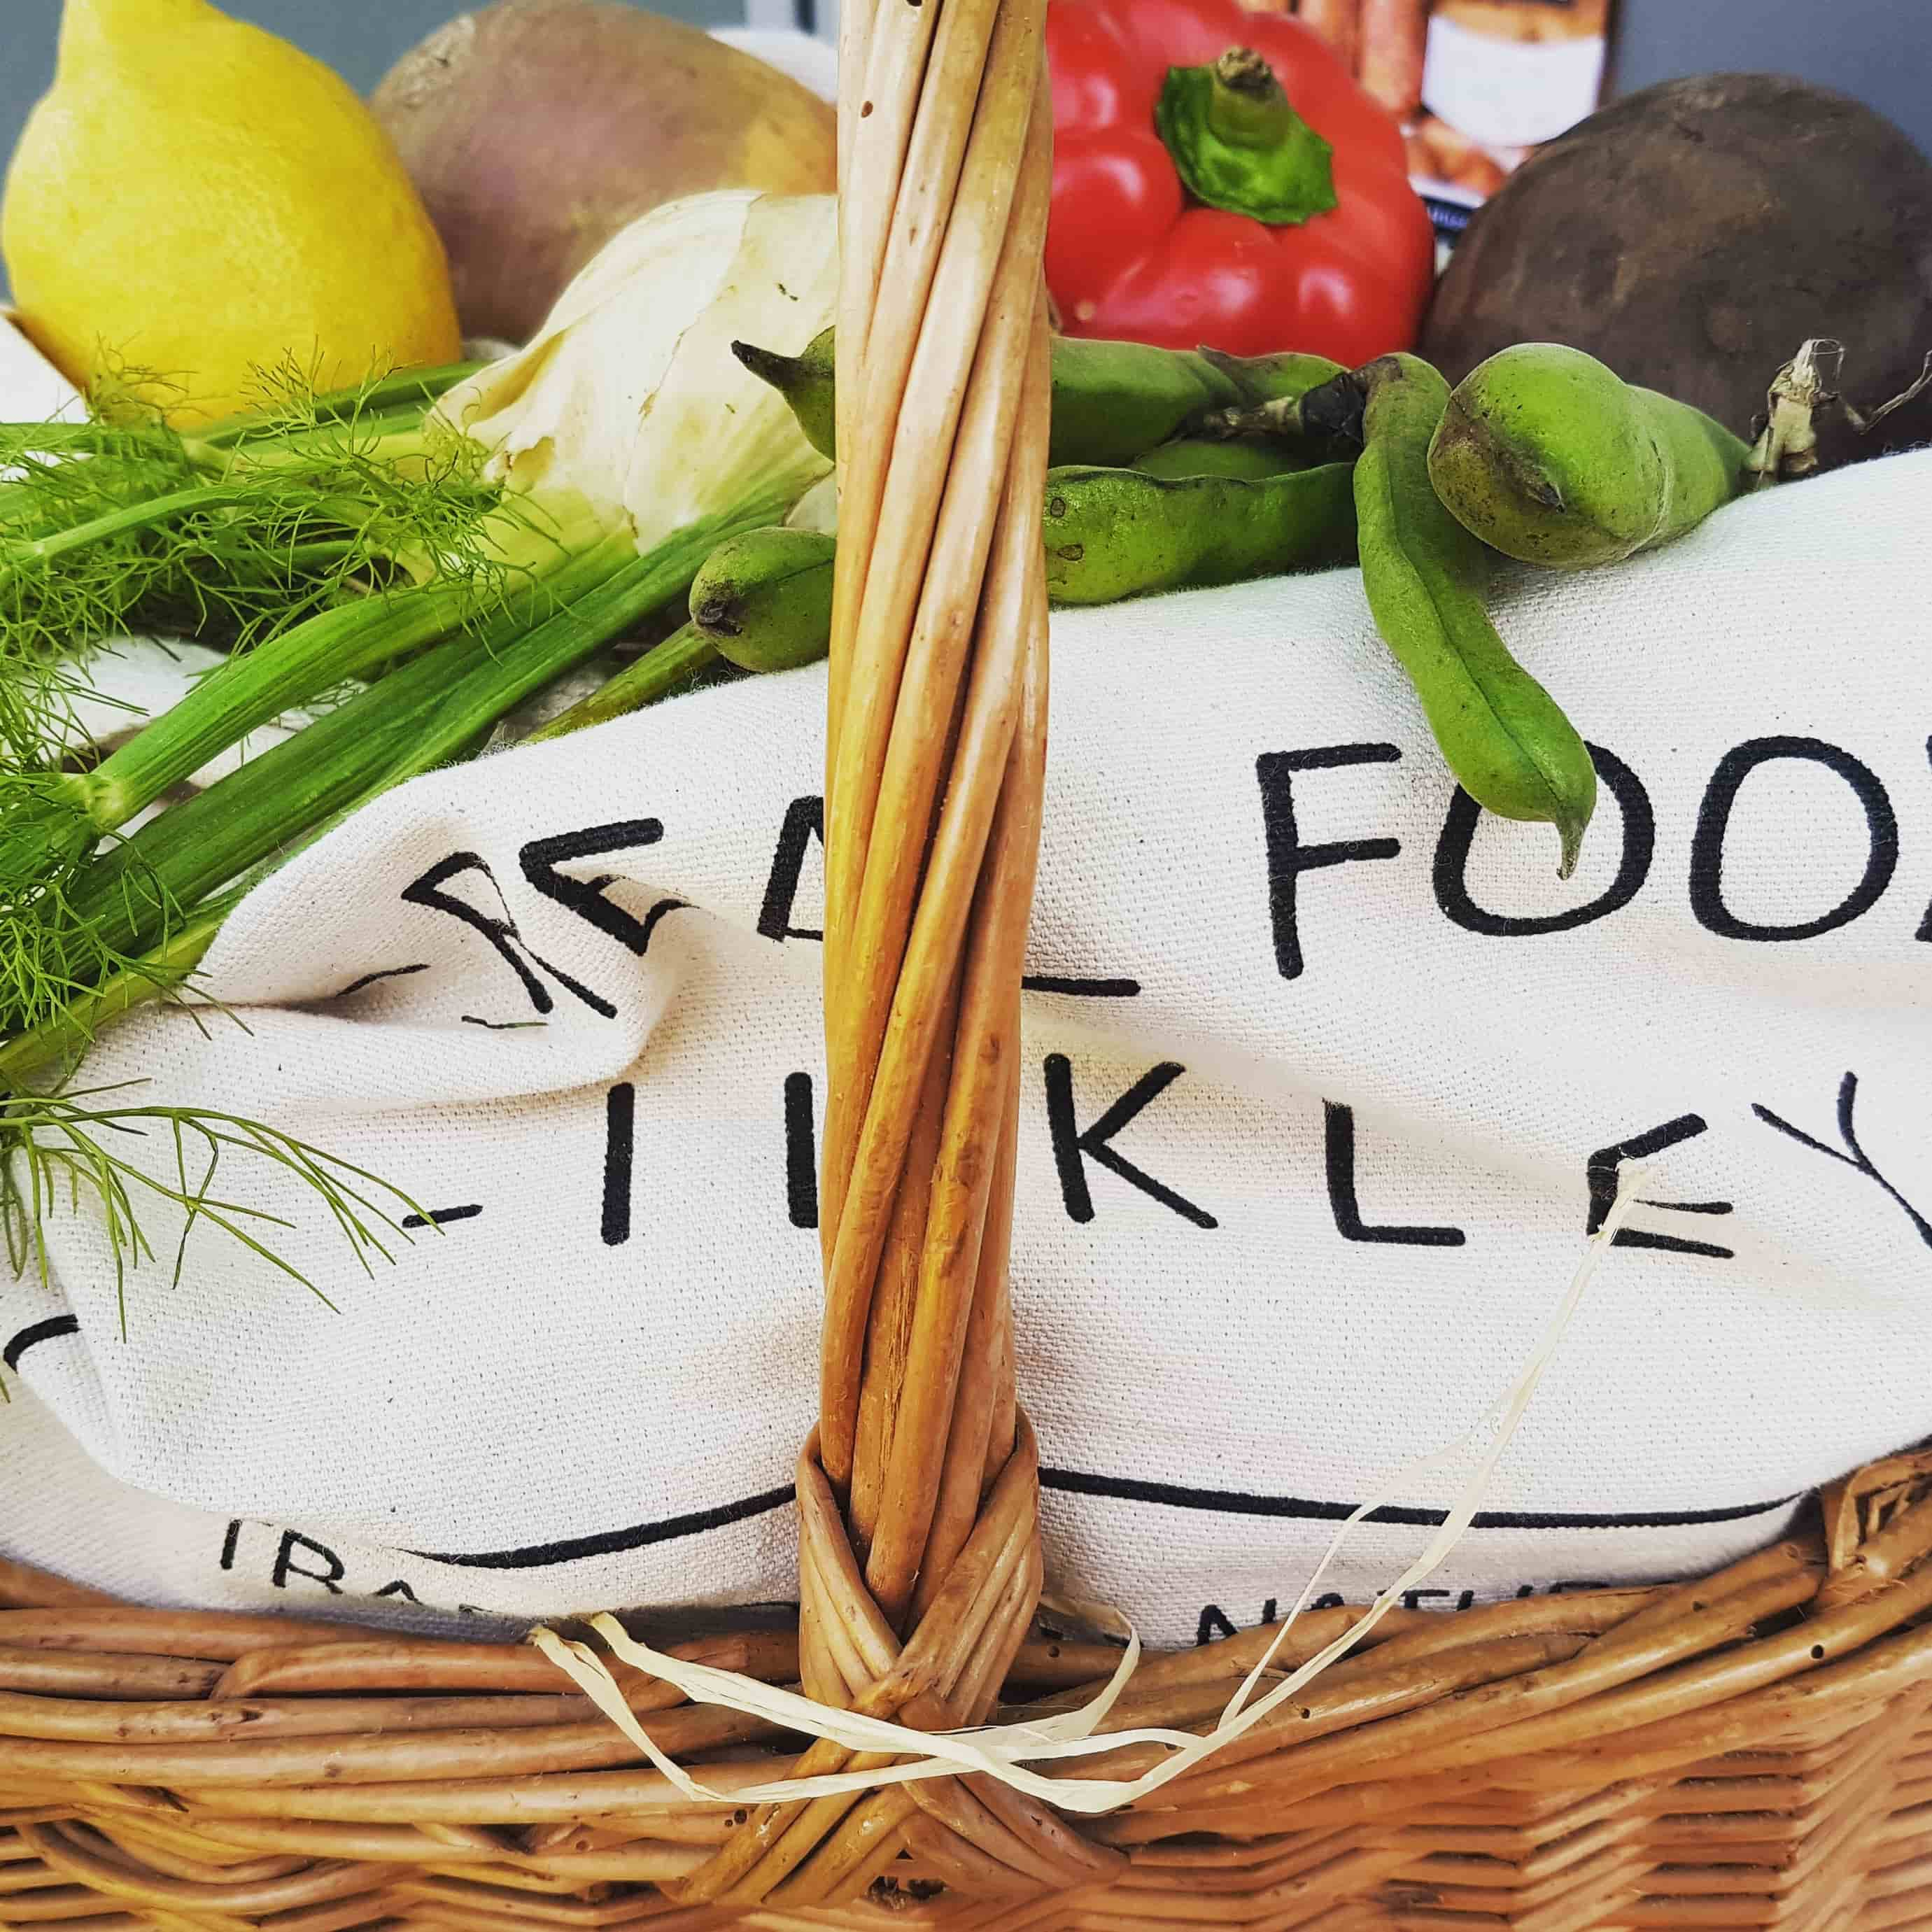 real food ilkley